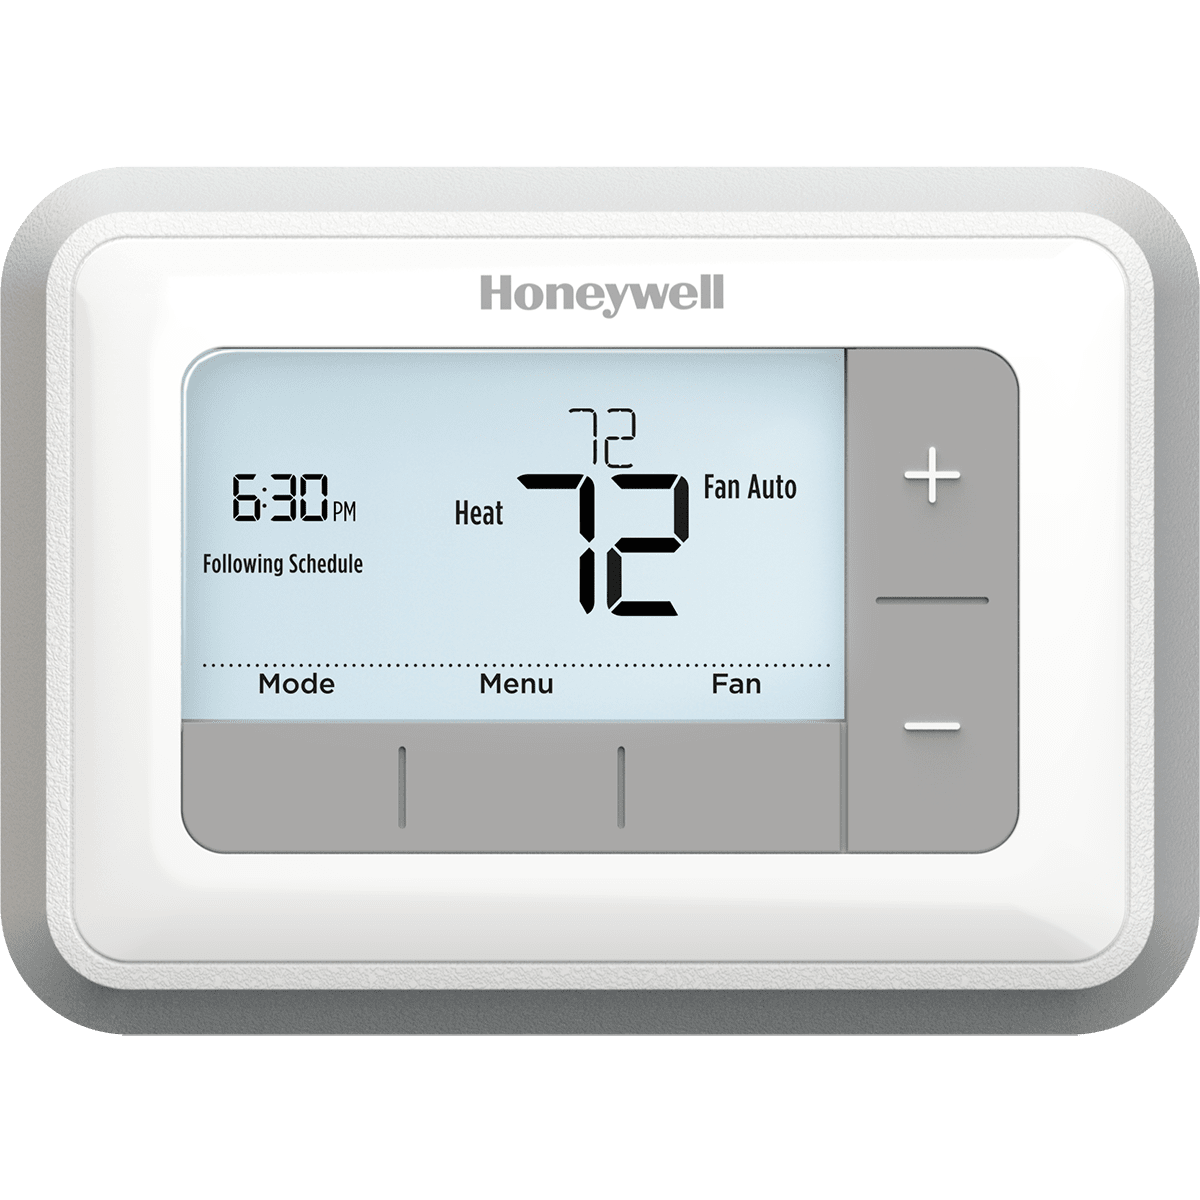 Honeywell T5 7